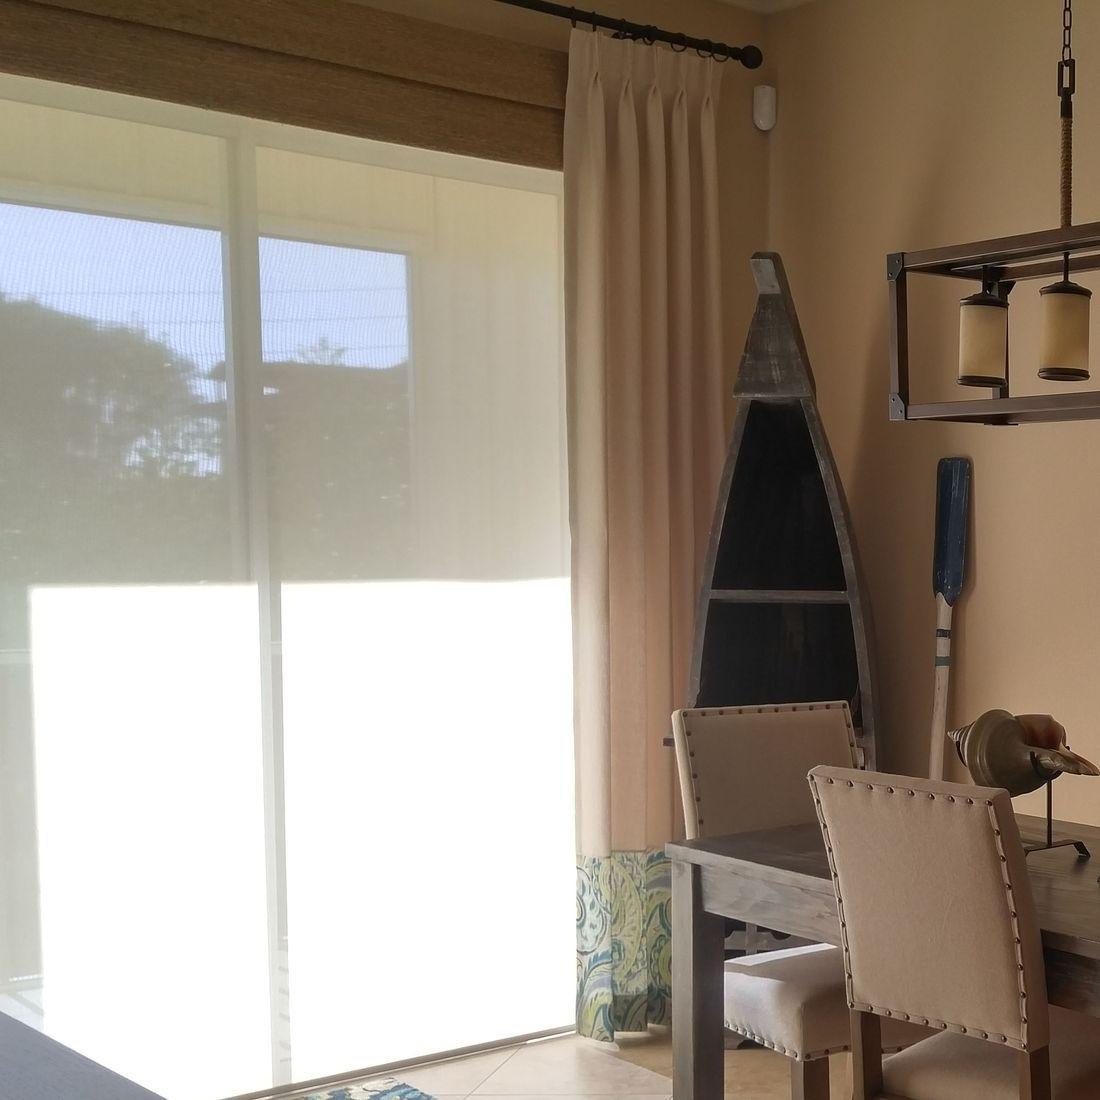 Solar Shades, folded roman cornice, side panels  Indian Rocks Beach Residence